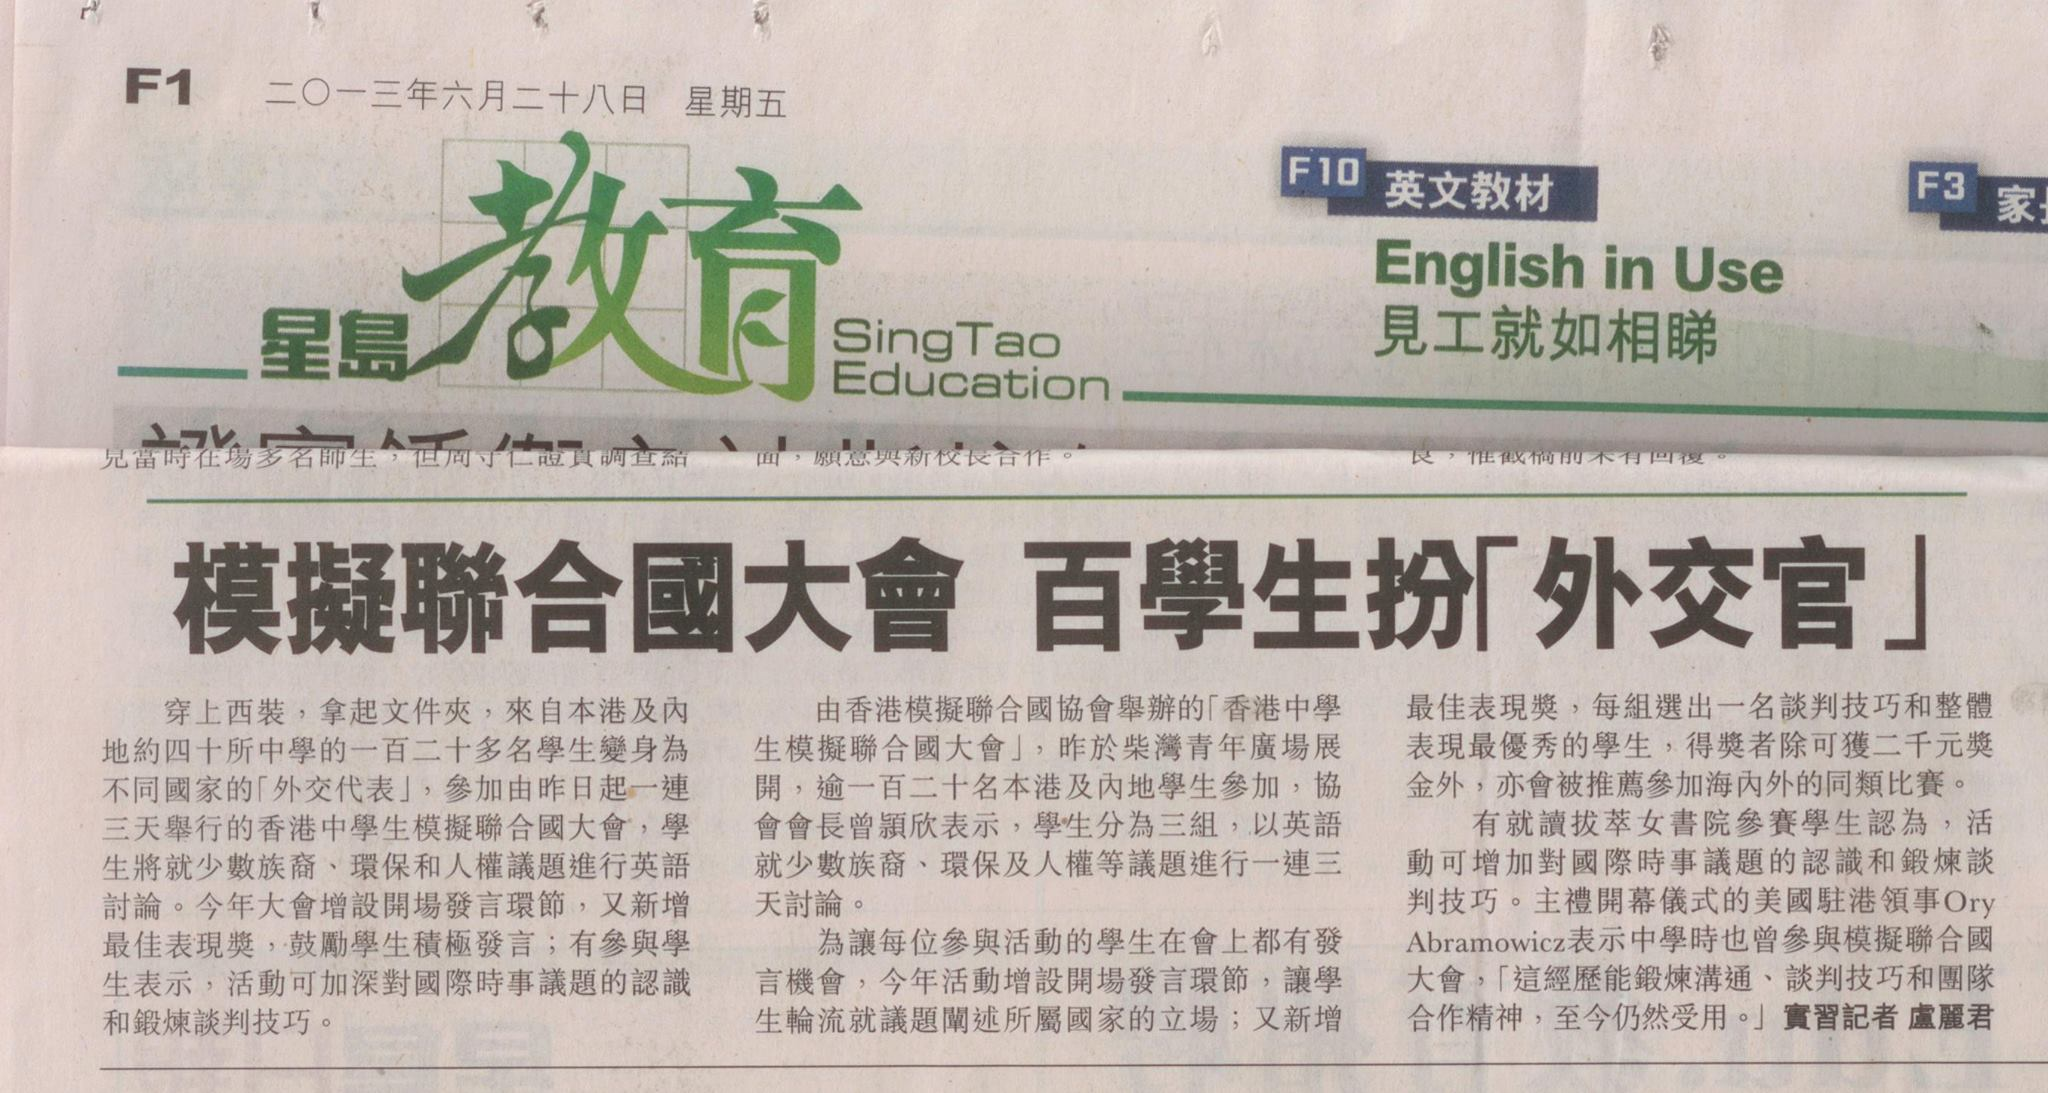 Sing Tao Daily, 28/06/2013